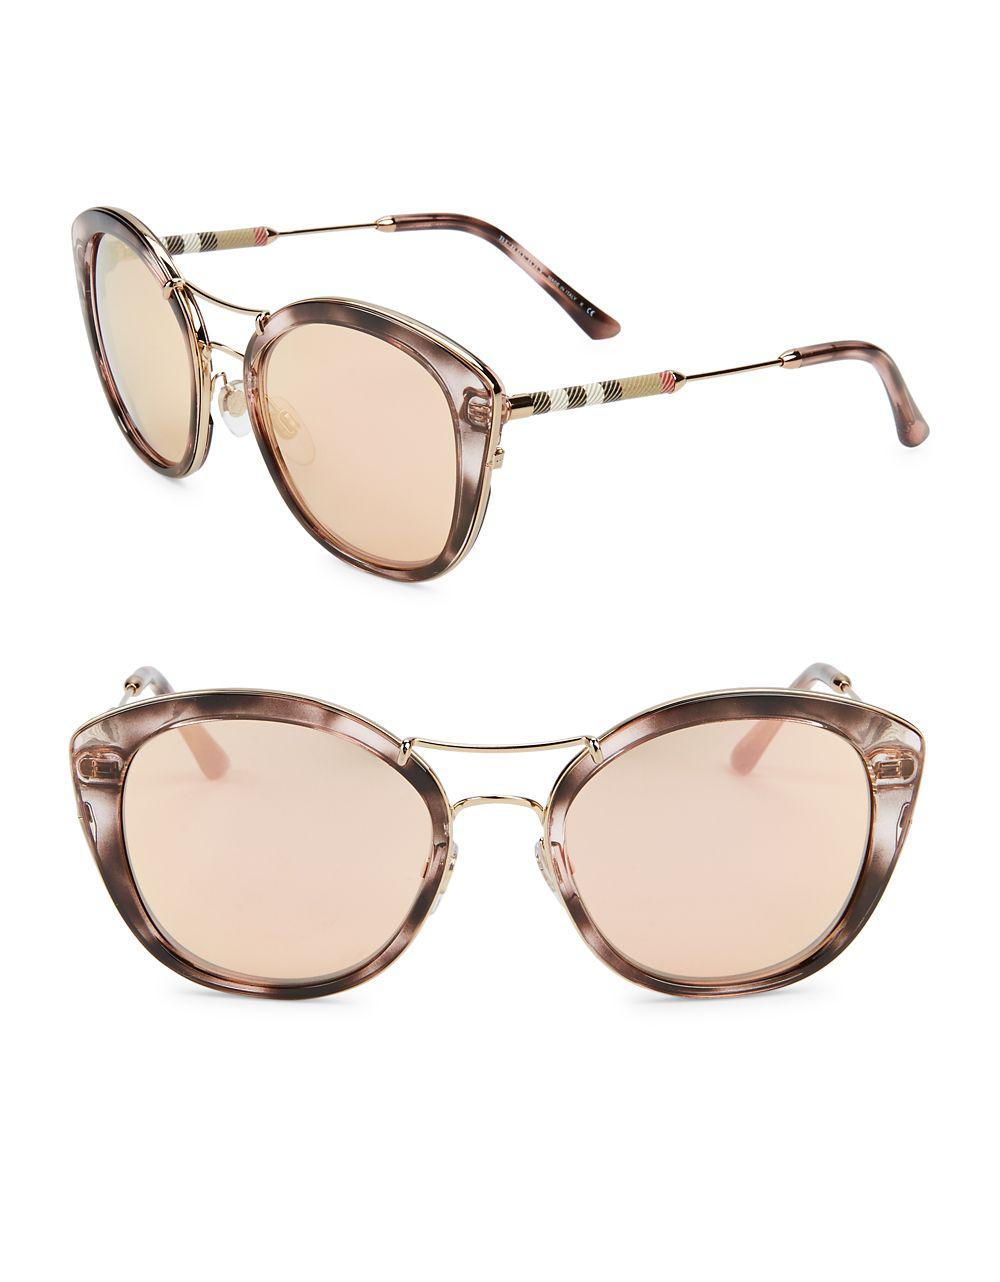 67f75c2866 Burberry. Women s 50mm Tinted Cat Eye Sunglasses